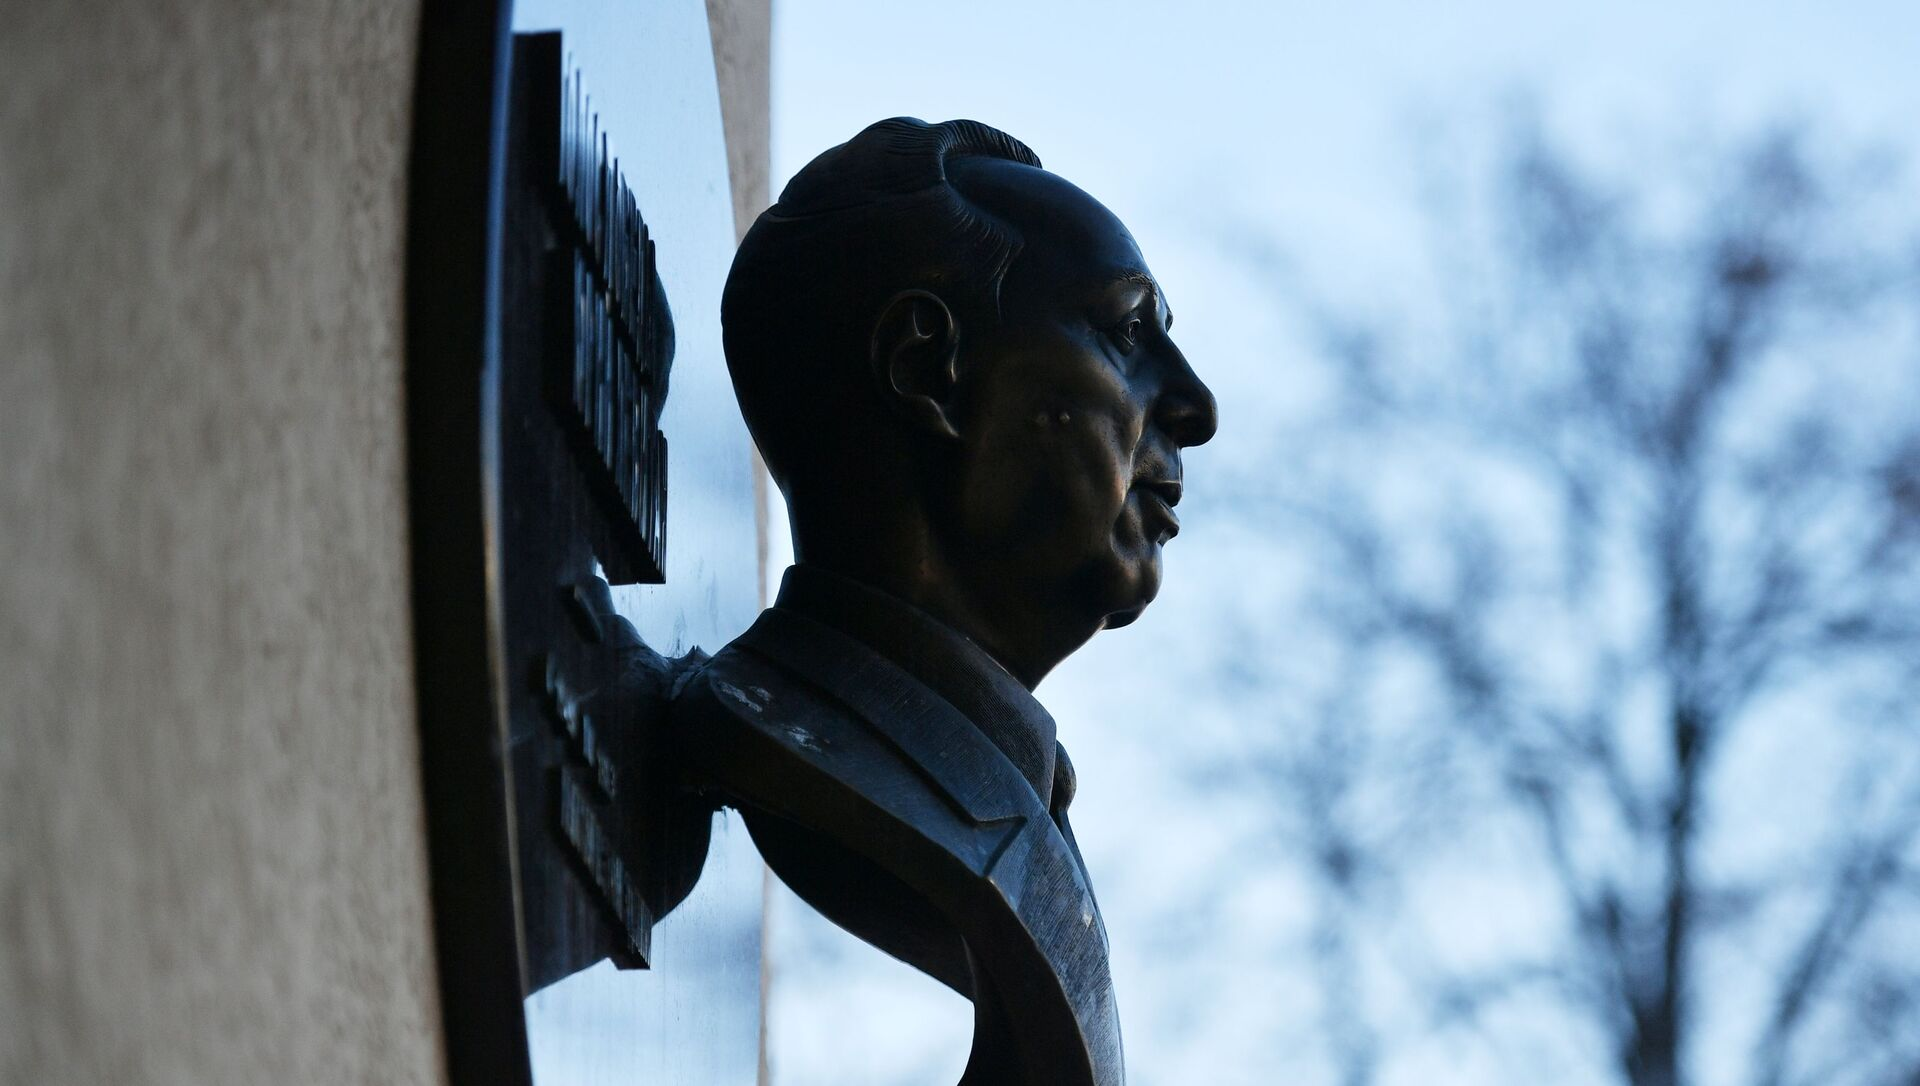 La targa commemorativa in memoria di Yuri Levitan - Sputnik Italia, 1920, 02.02.2021